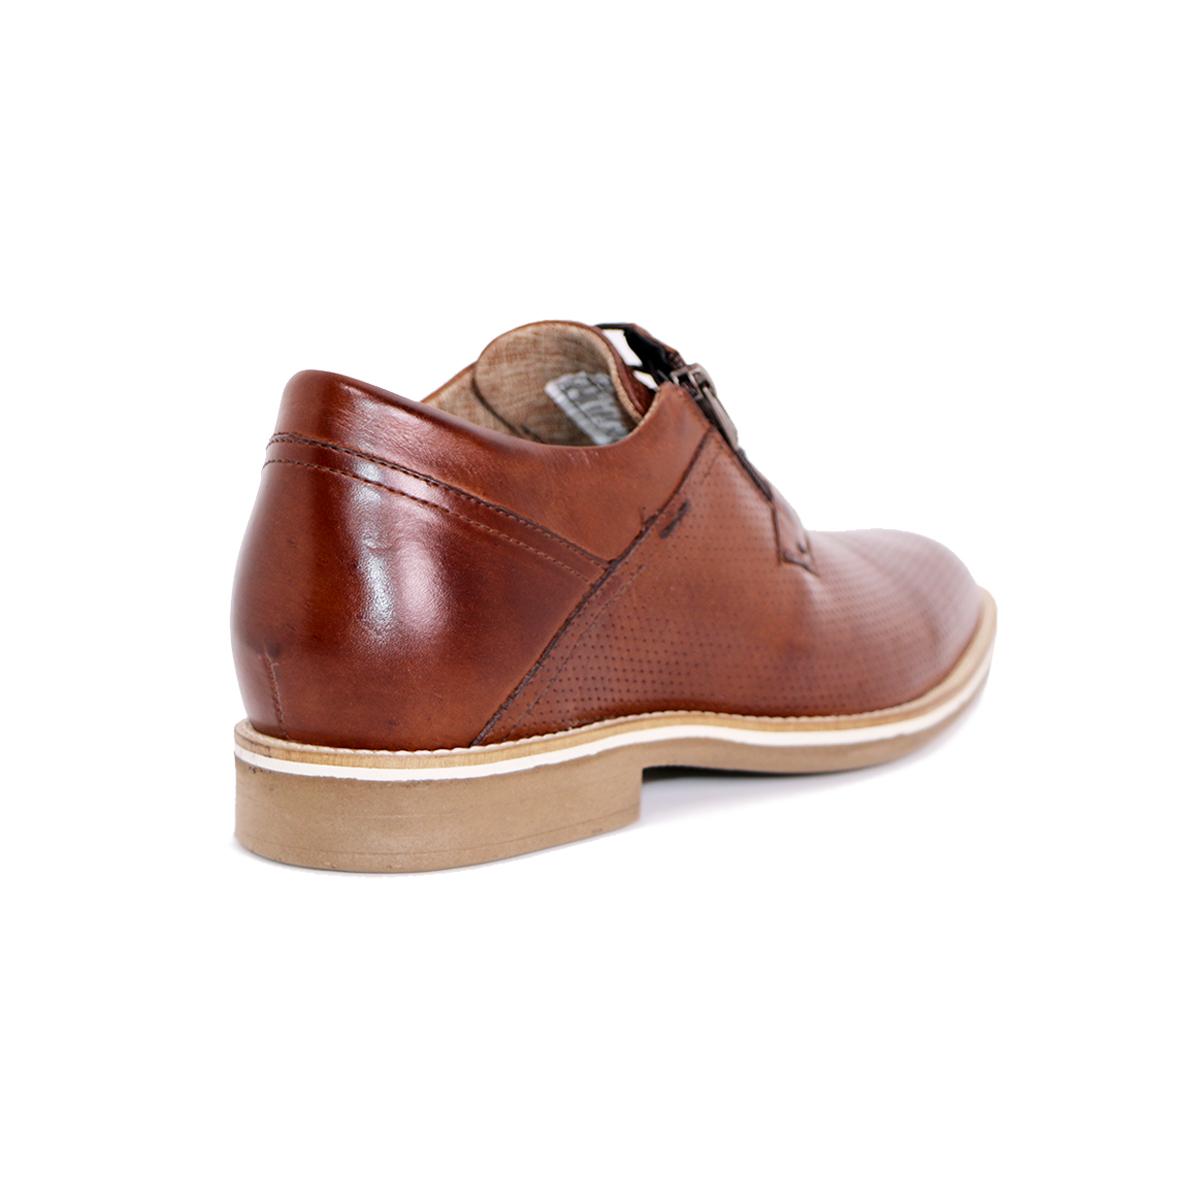 Zapato Casual Break Café Max Denegri +7cms De Altura_72701